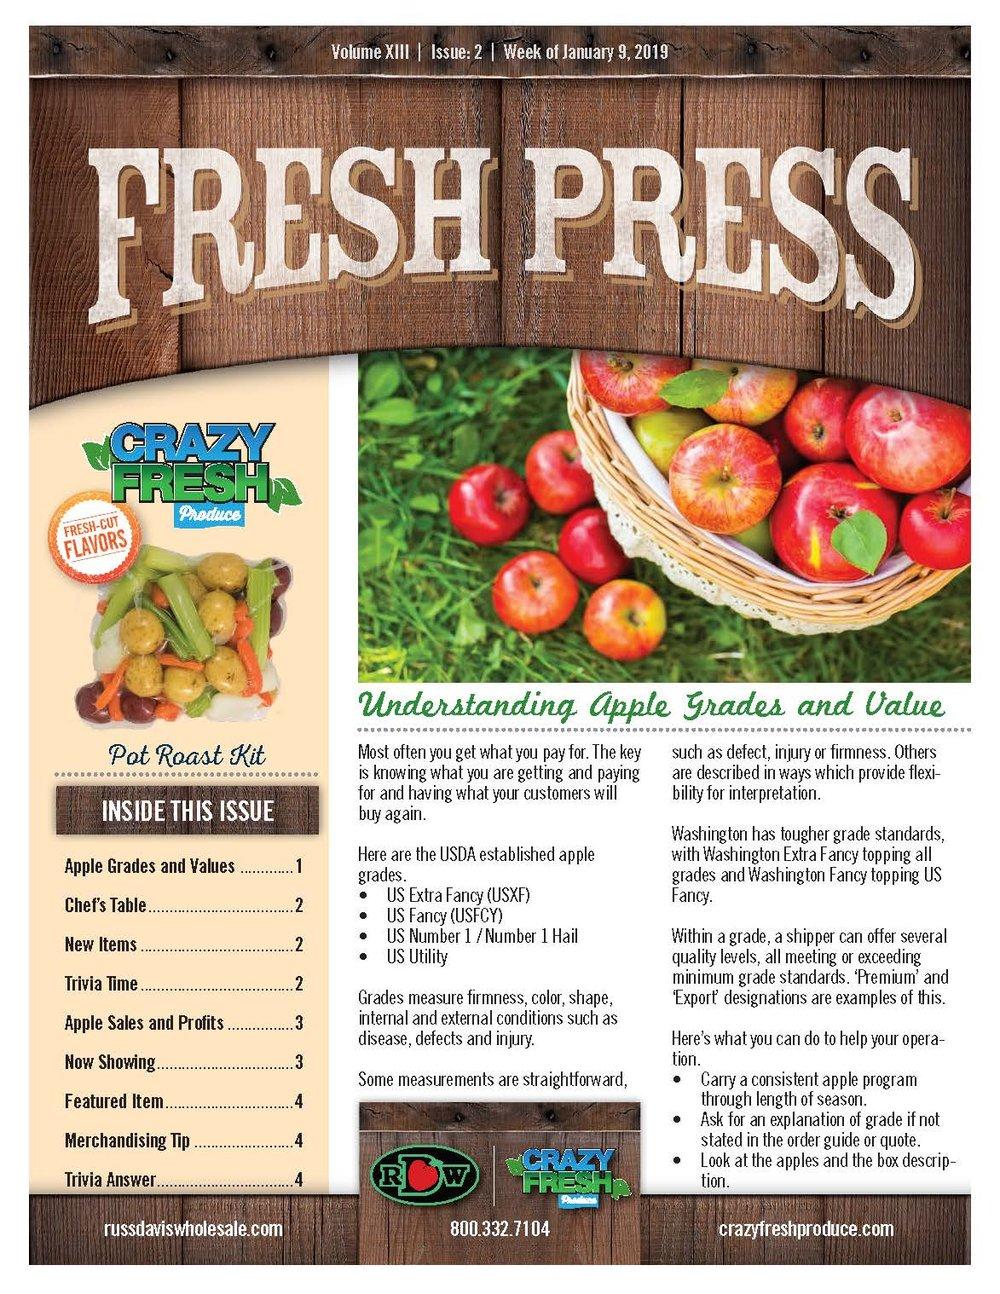 RDW_Fresh_Press_Jan9_2019_Page_1.jpg